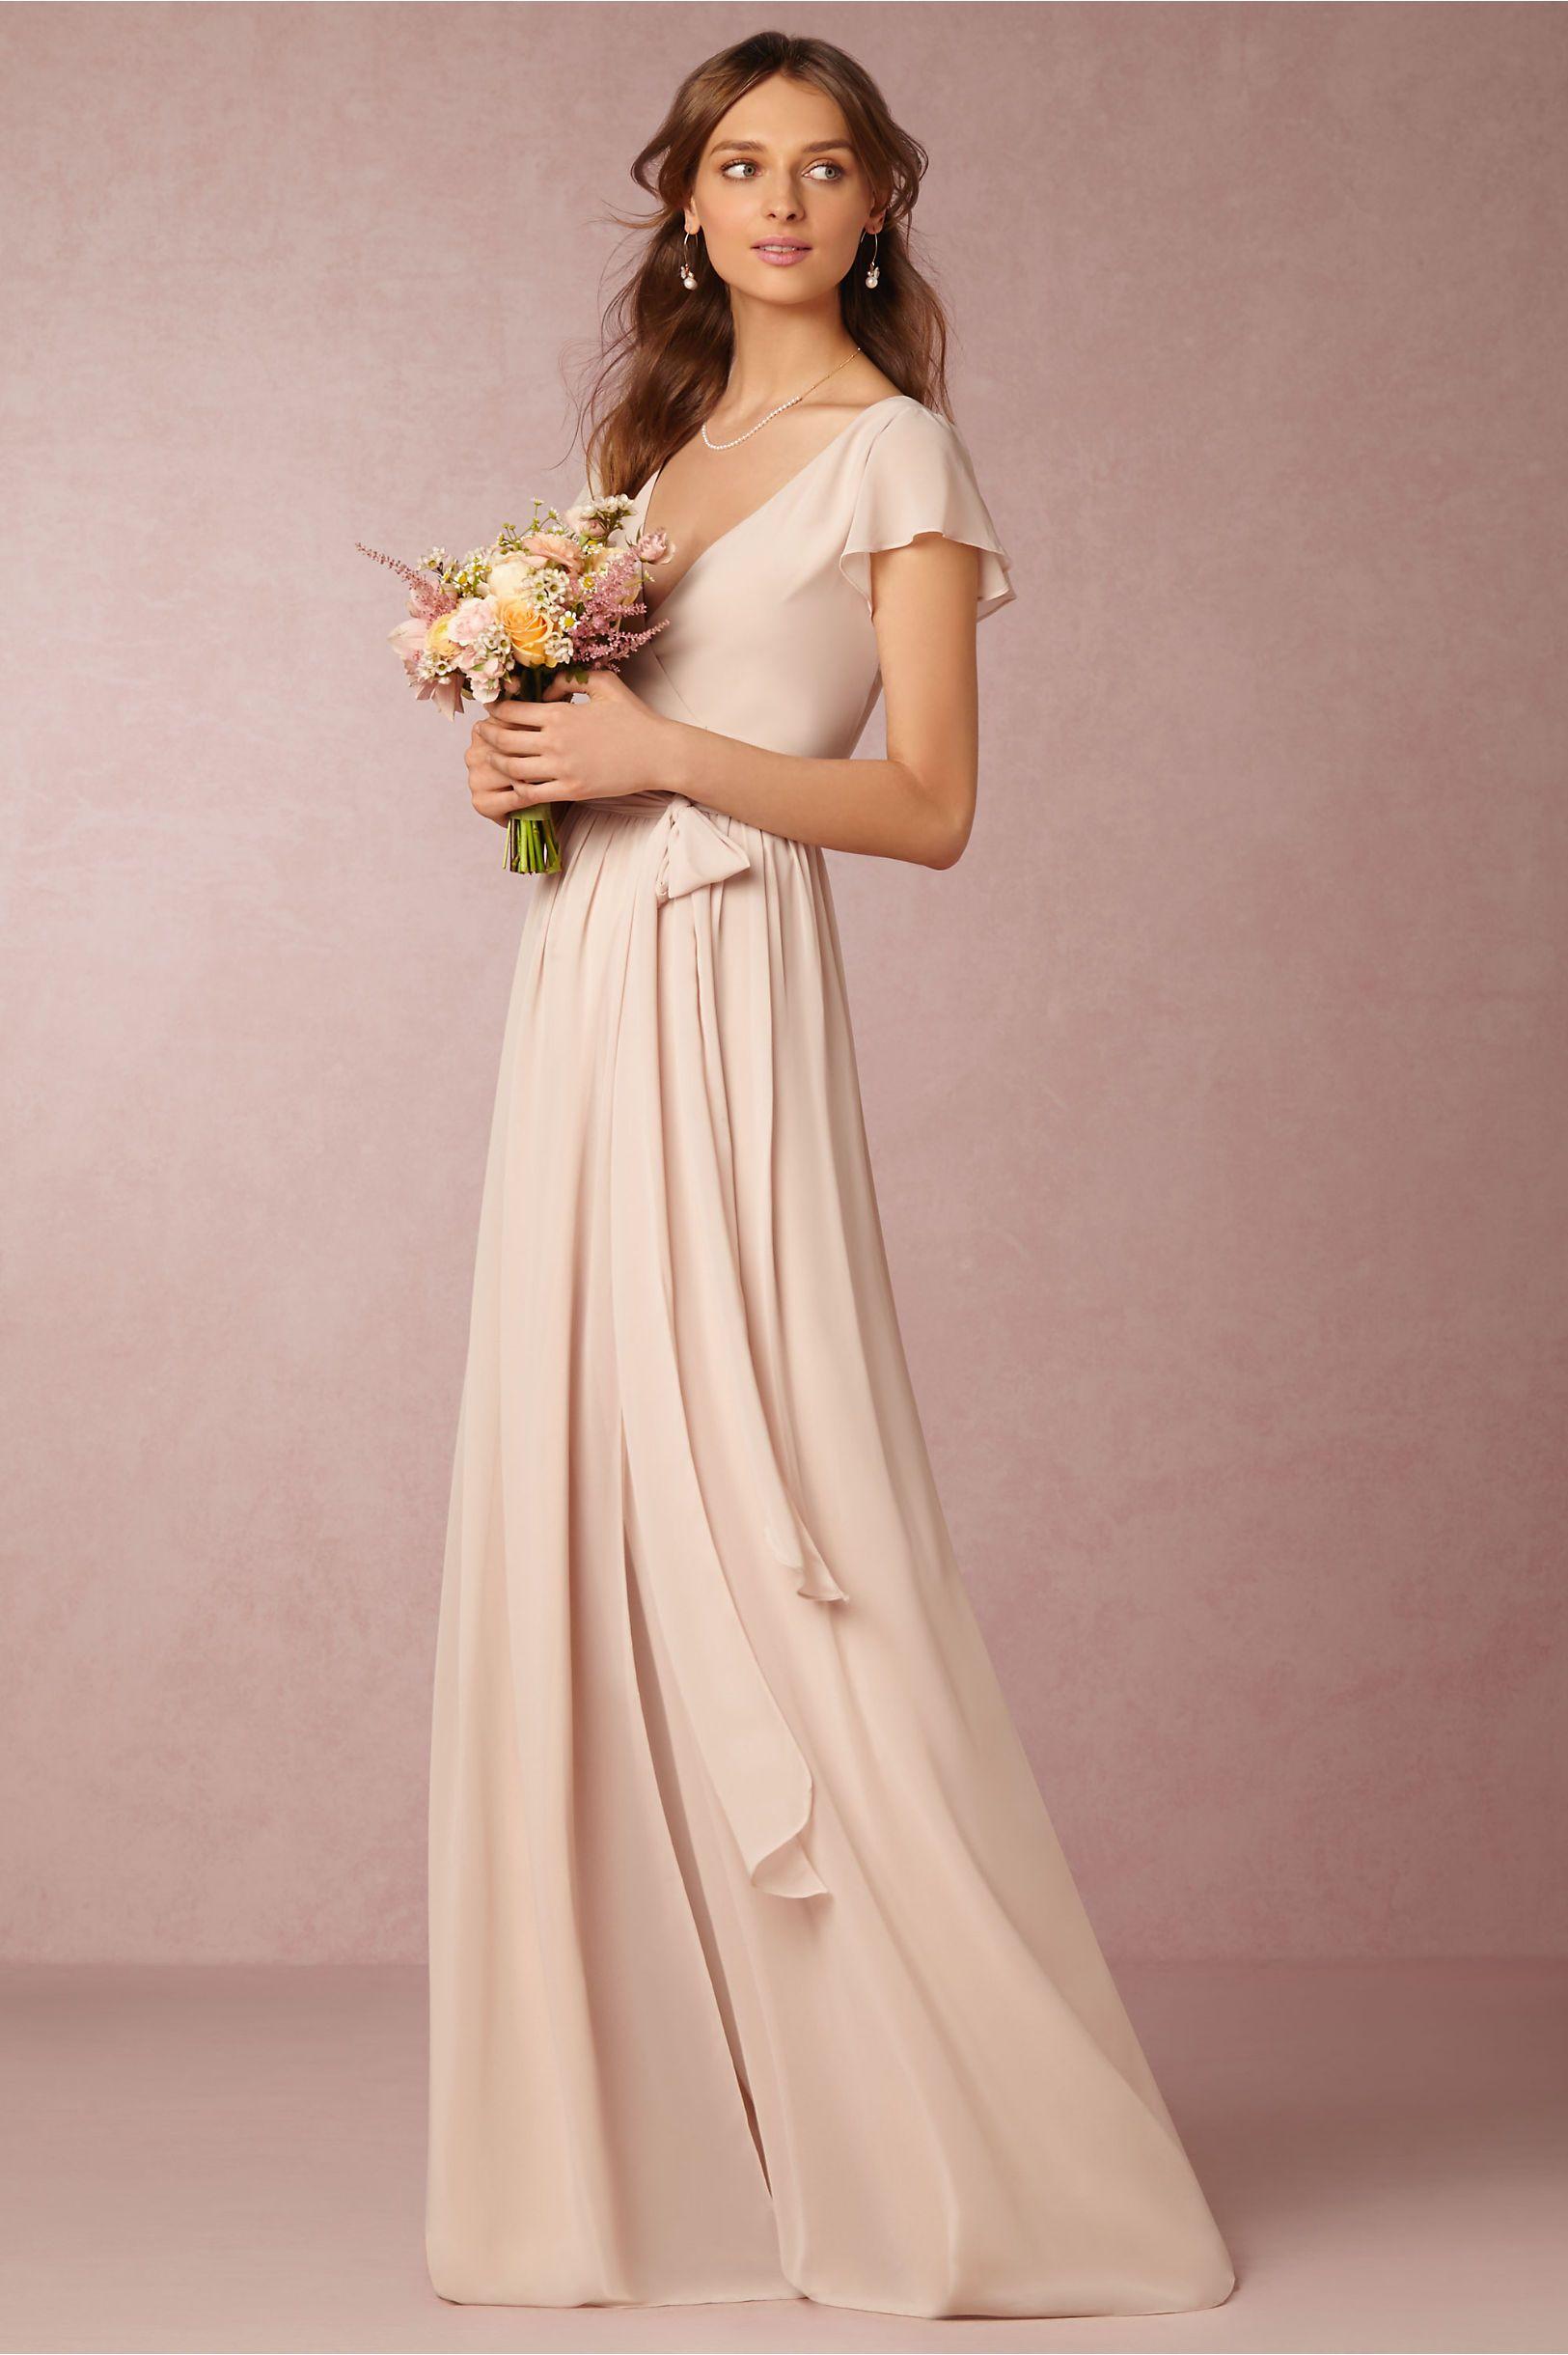 BHLDN Zola Dress in Bridesmaids Bridesmaid Dresses at BHLDN ...